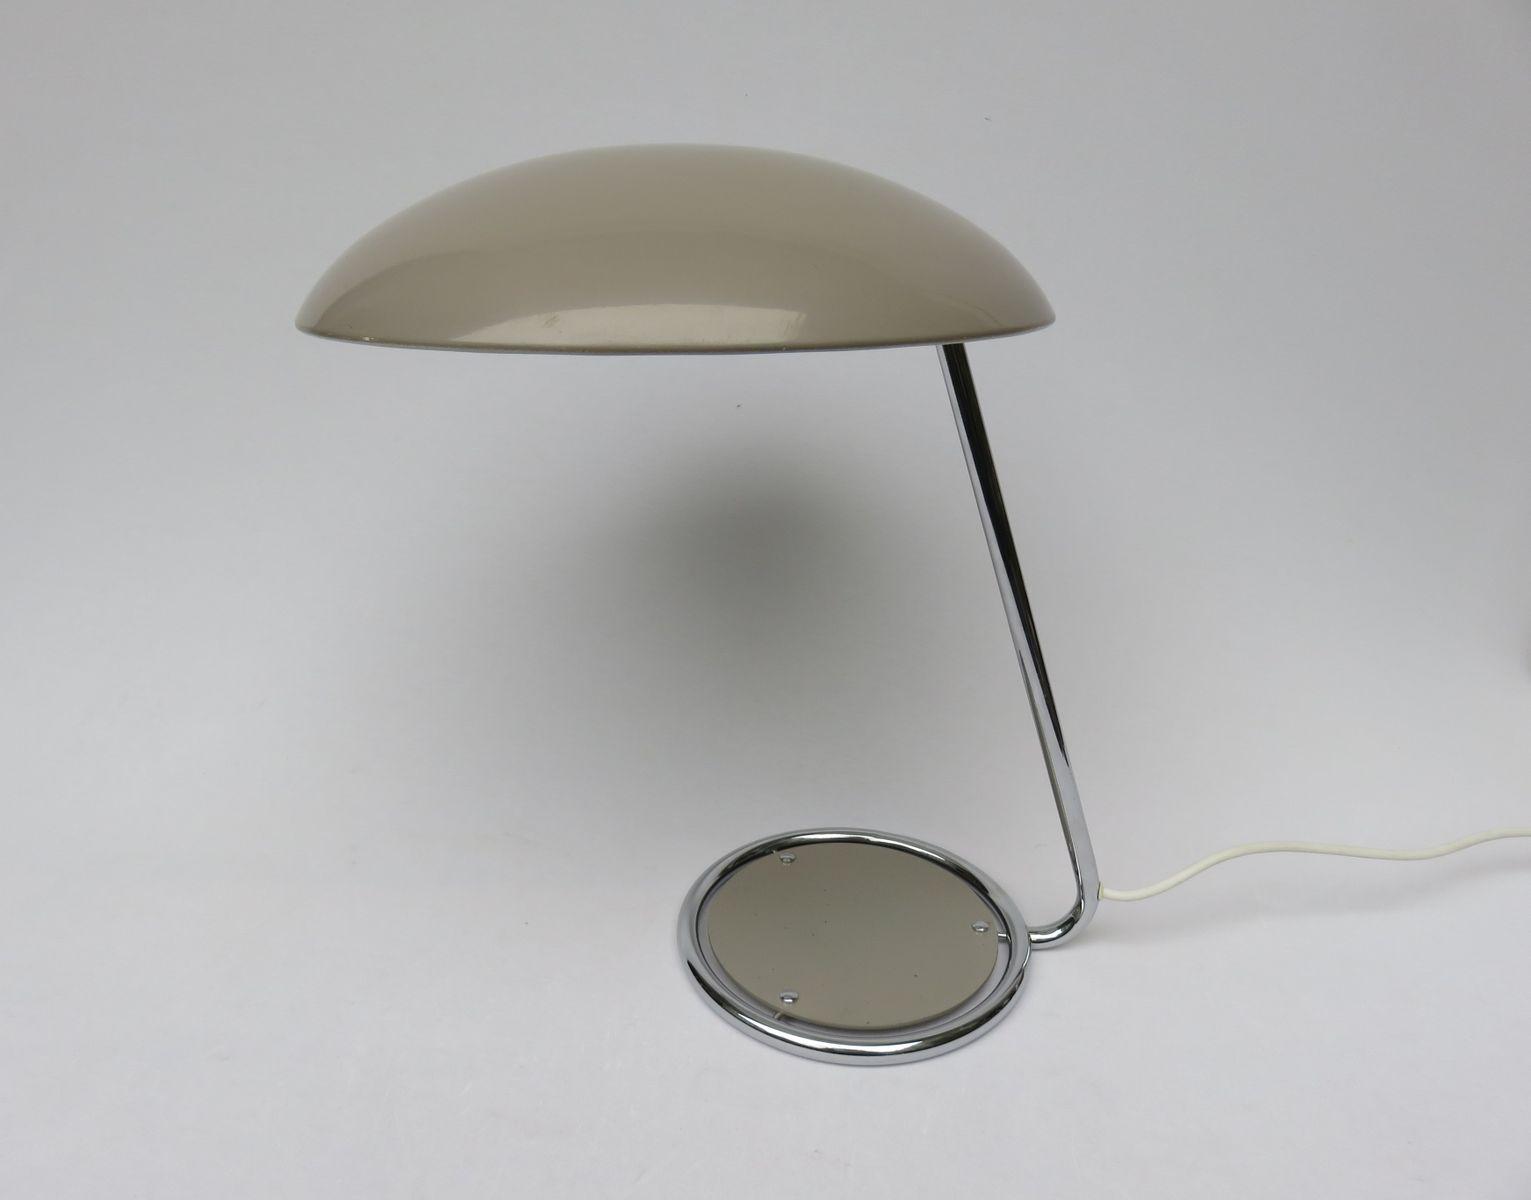 Lampe de bureau gris rose de kaiser leuchten 1960s en - Lampe de bureau rose ...